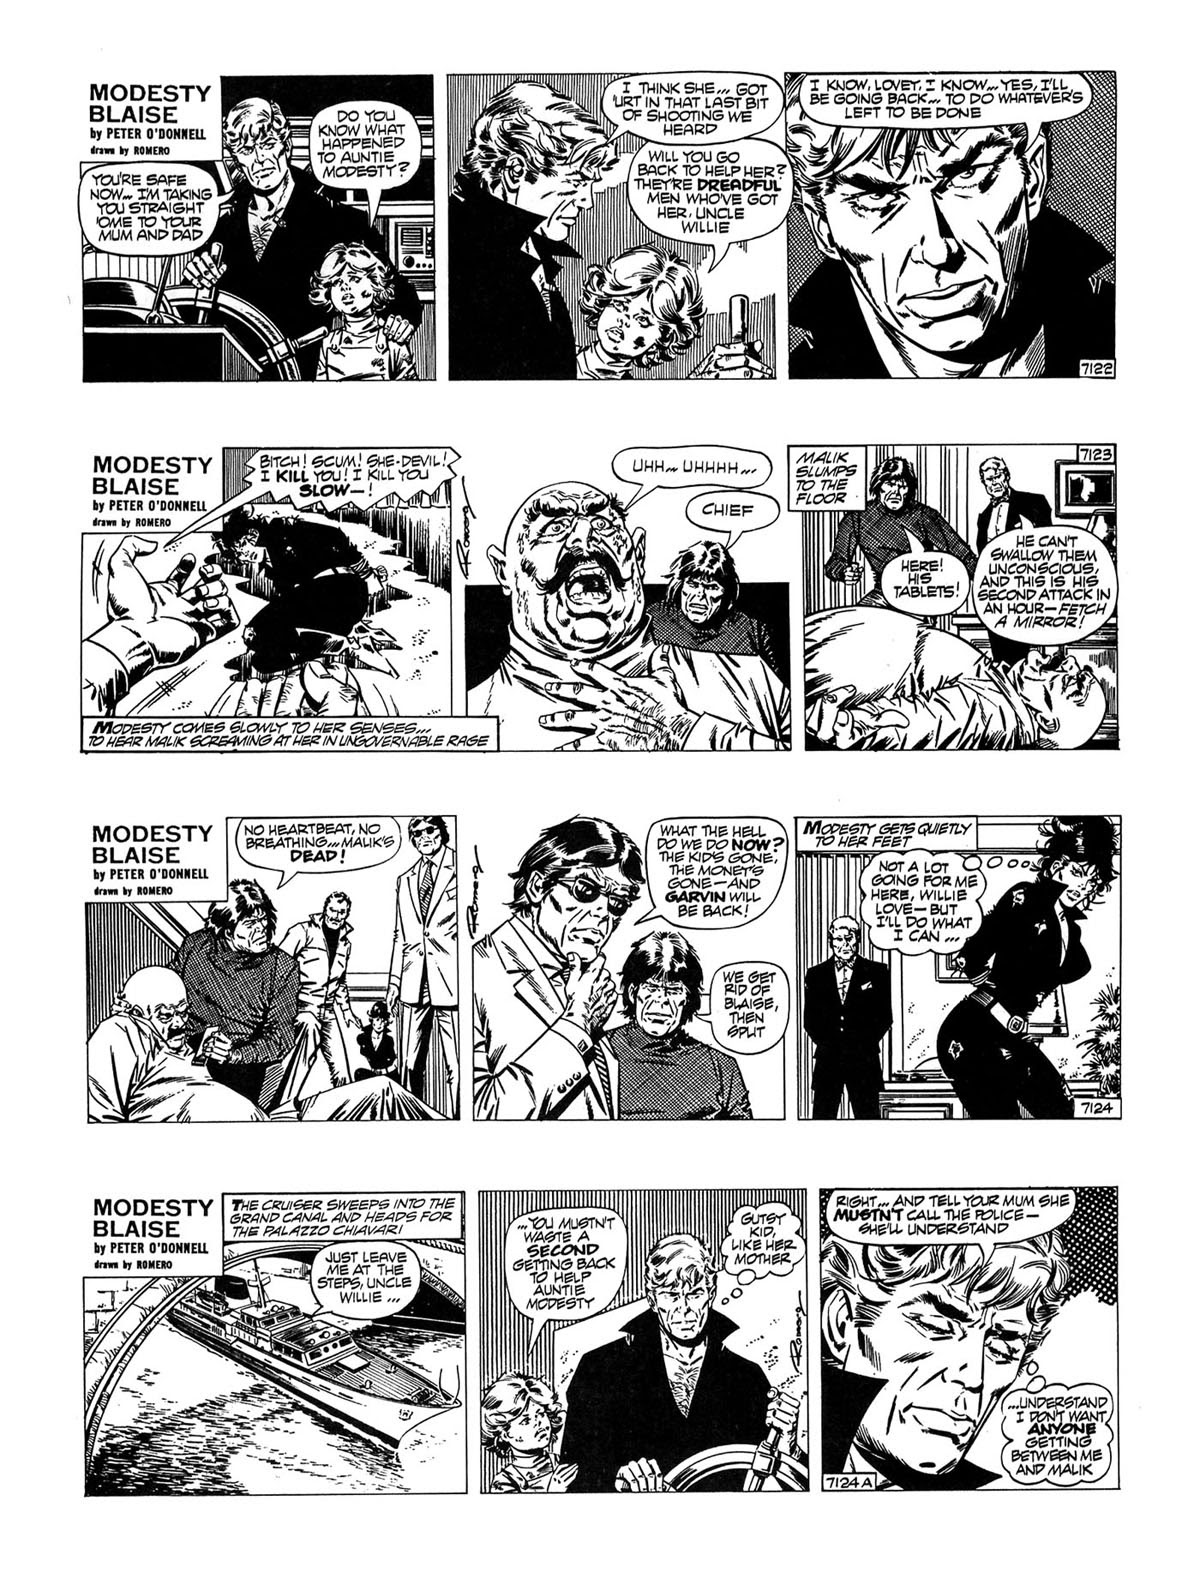 Read online Modesty Blaise Live bait comic -  Issue # TPB - 28